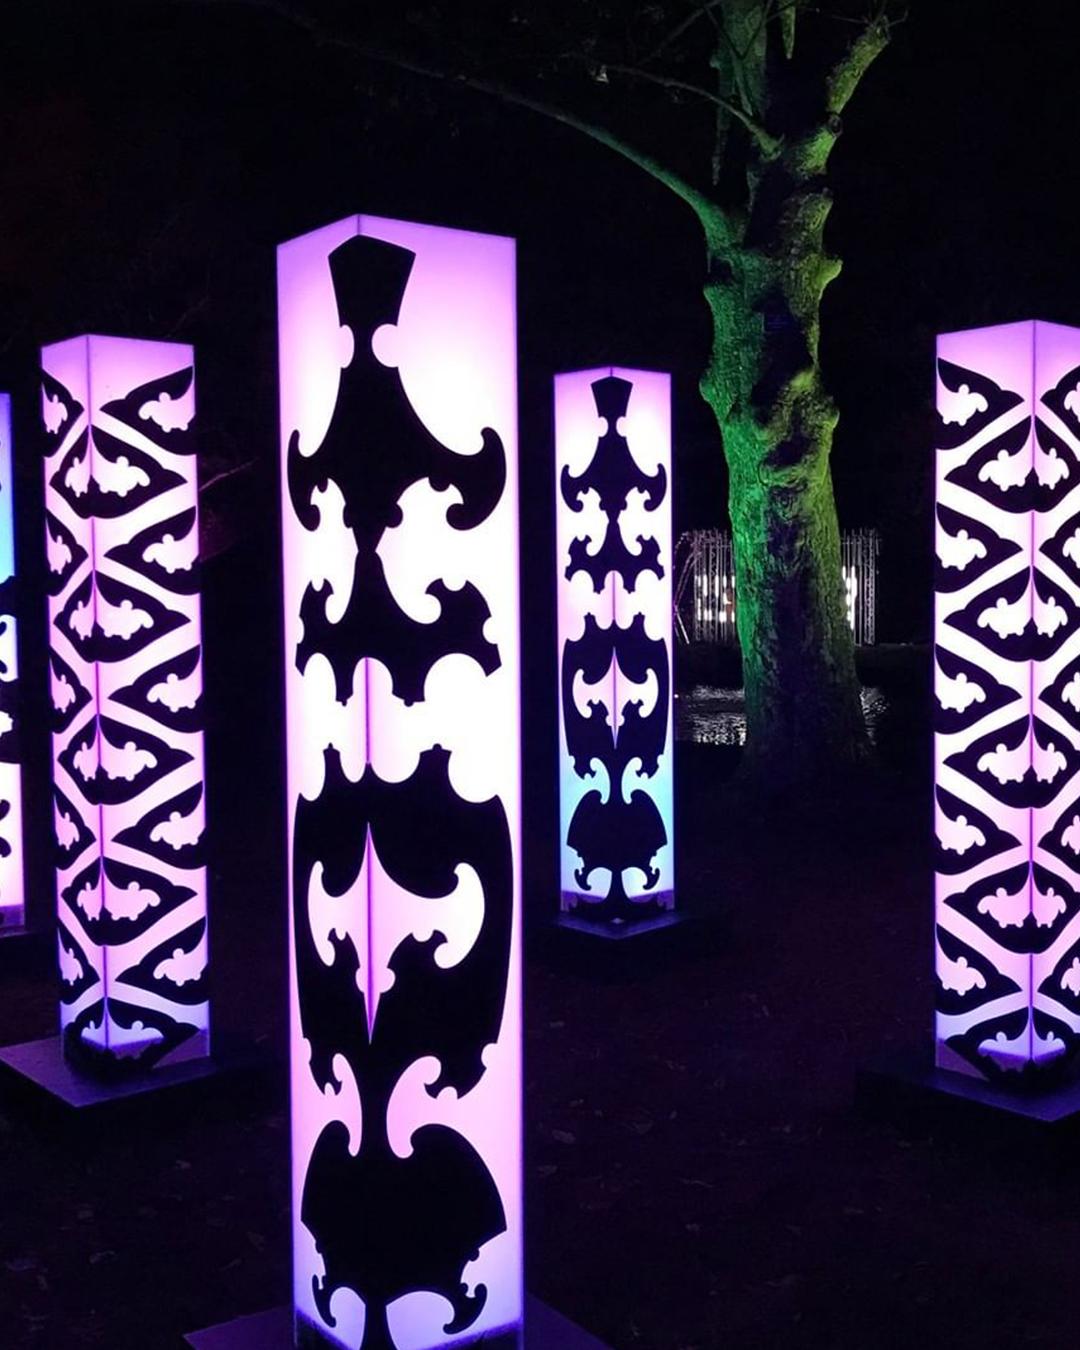 A creative work at Te Ramaroa Light Festival